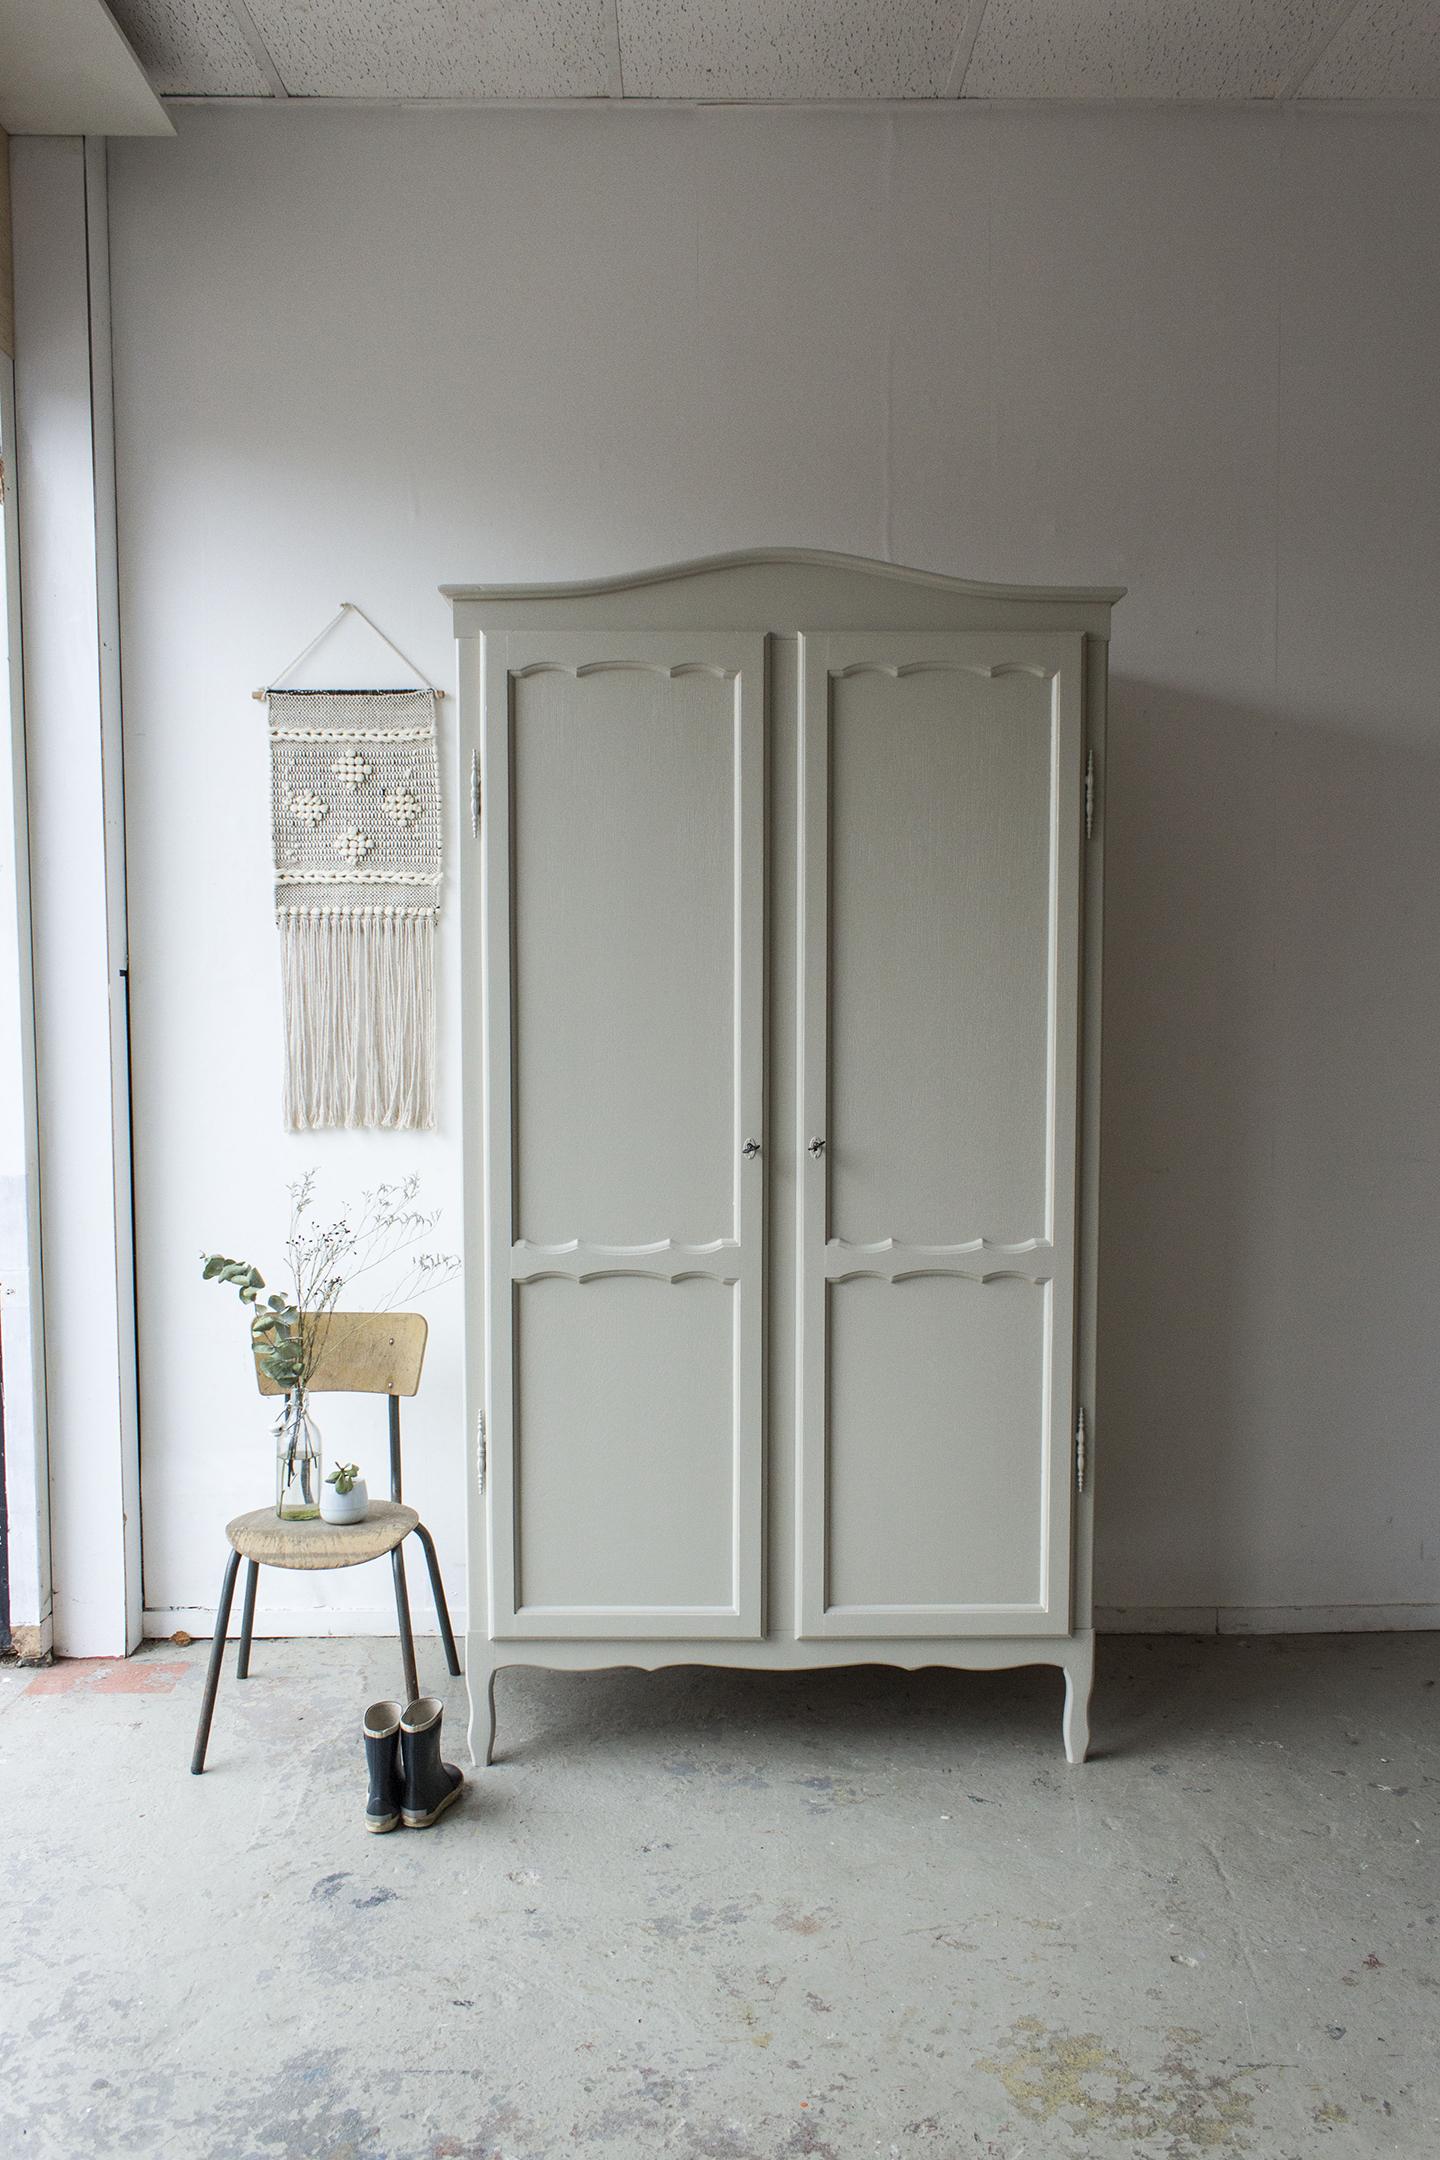 1406- demontabele sierlijke vintage kast in Linnen kleur - Firma zoethout.jpg